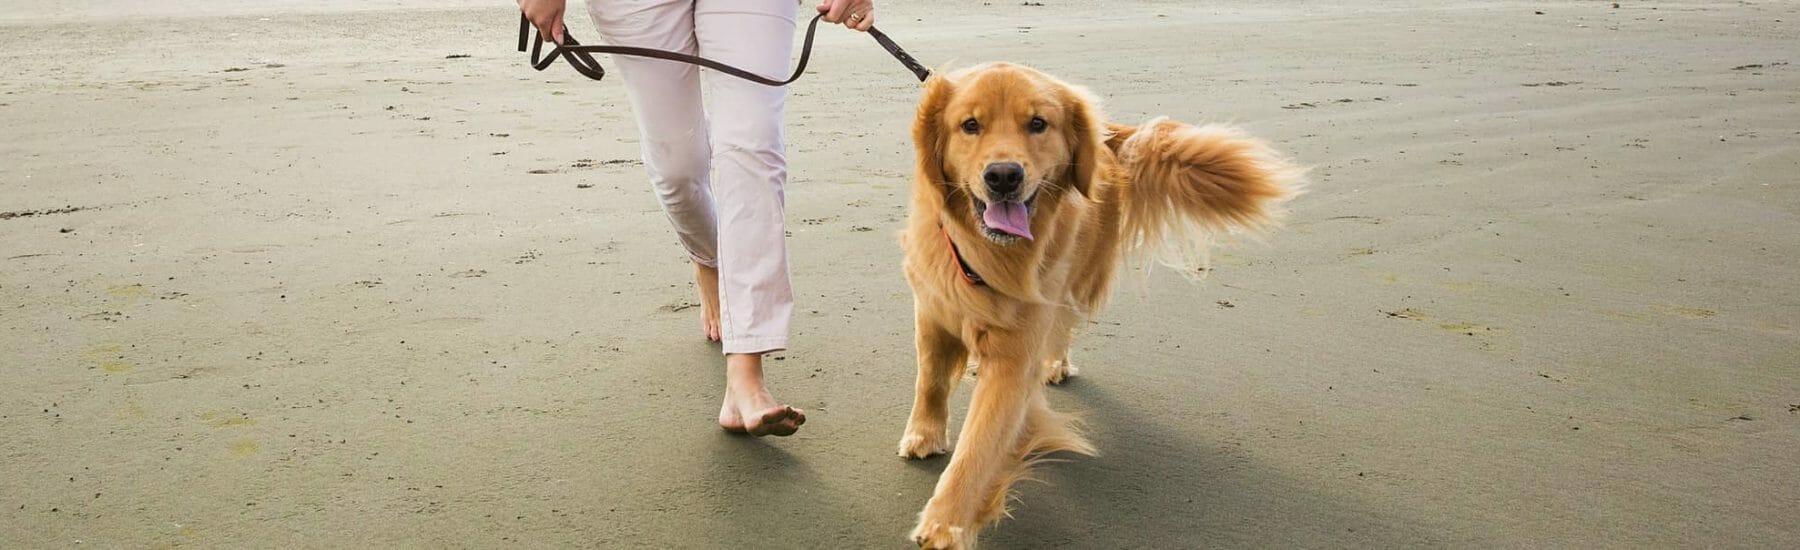 Golden retriever walking on the beach